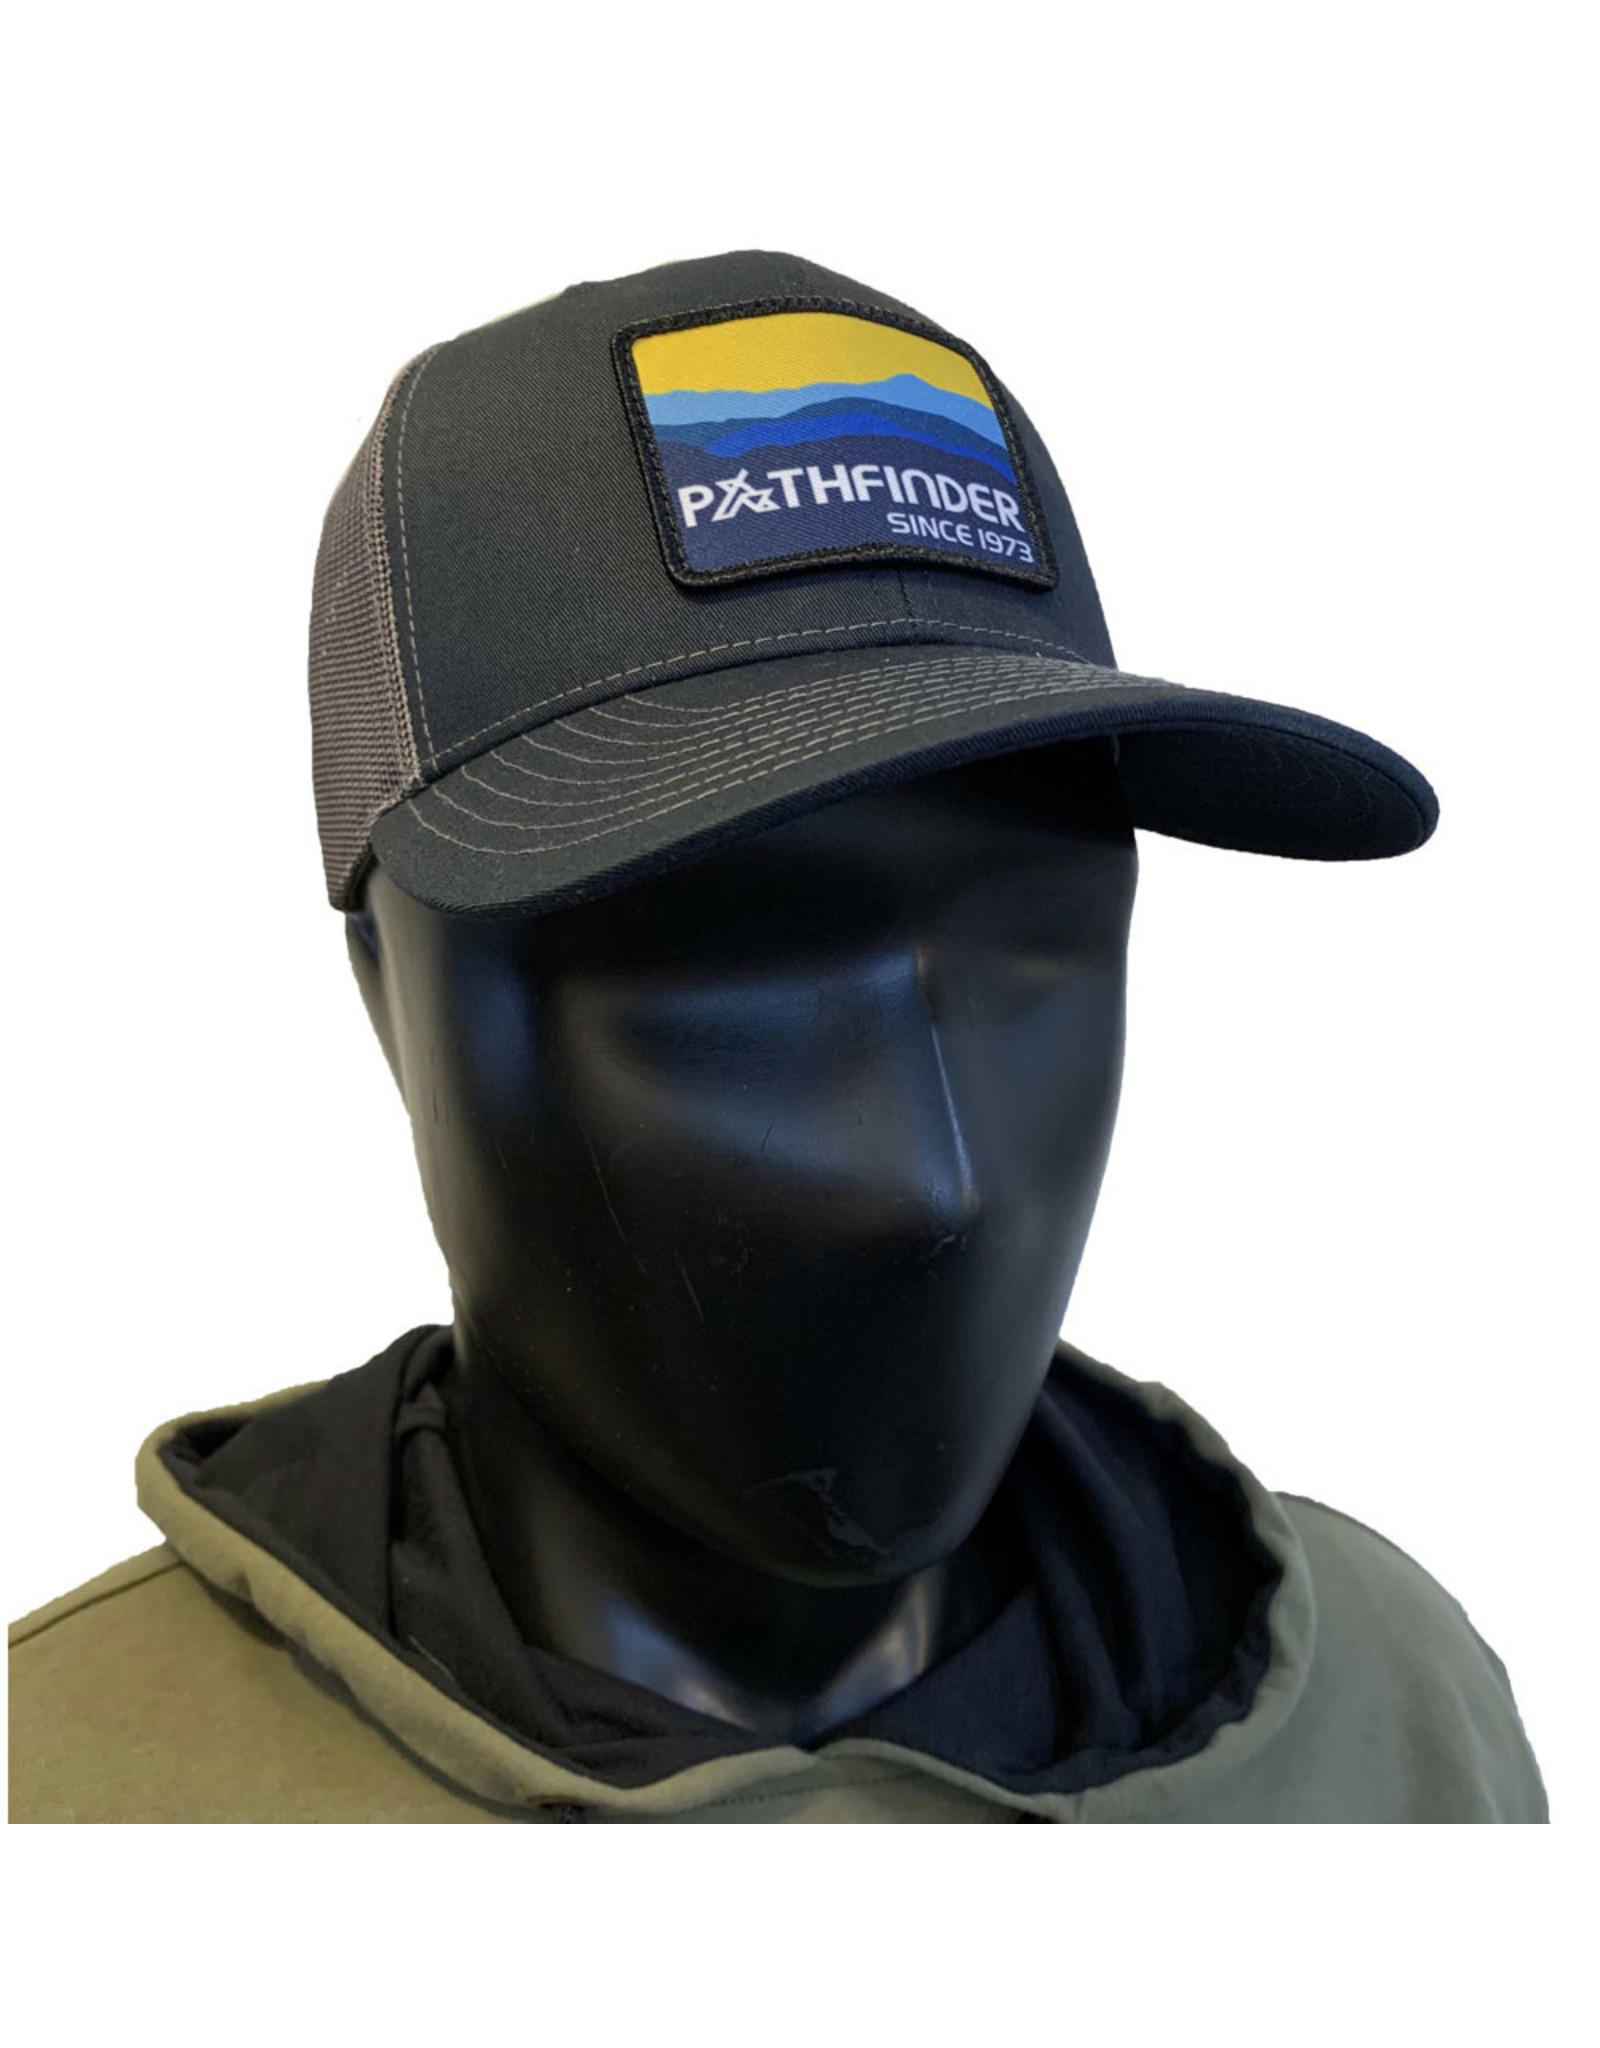 Pathfinder Mesh Back Trucker Blue/Gold Mountains